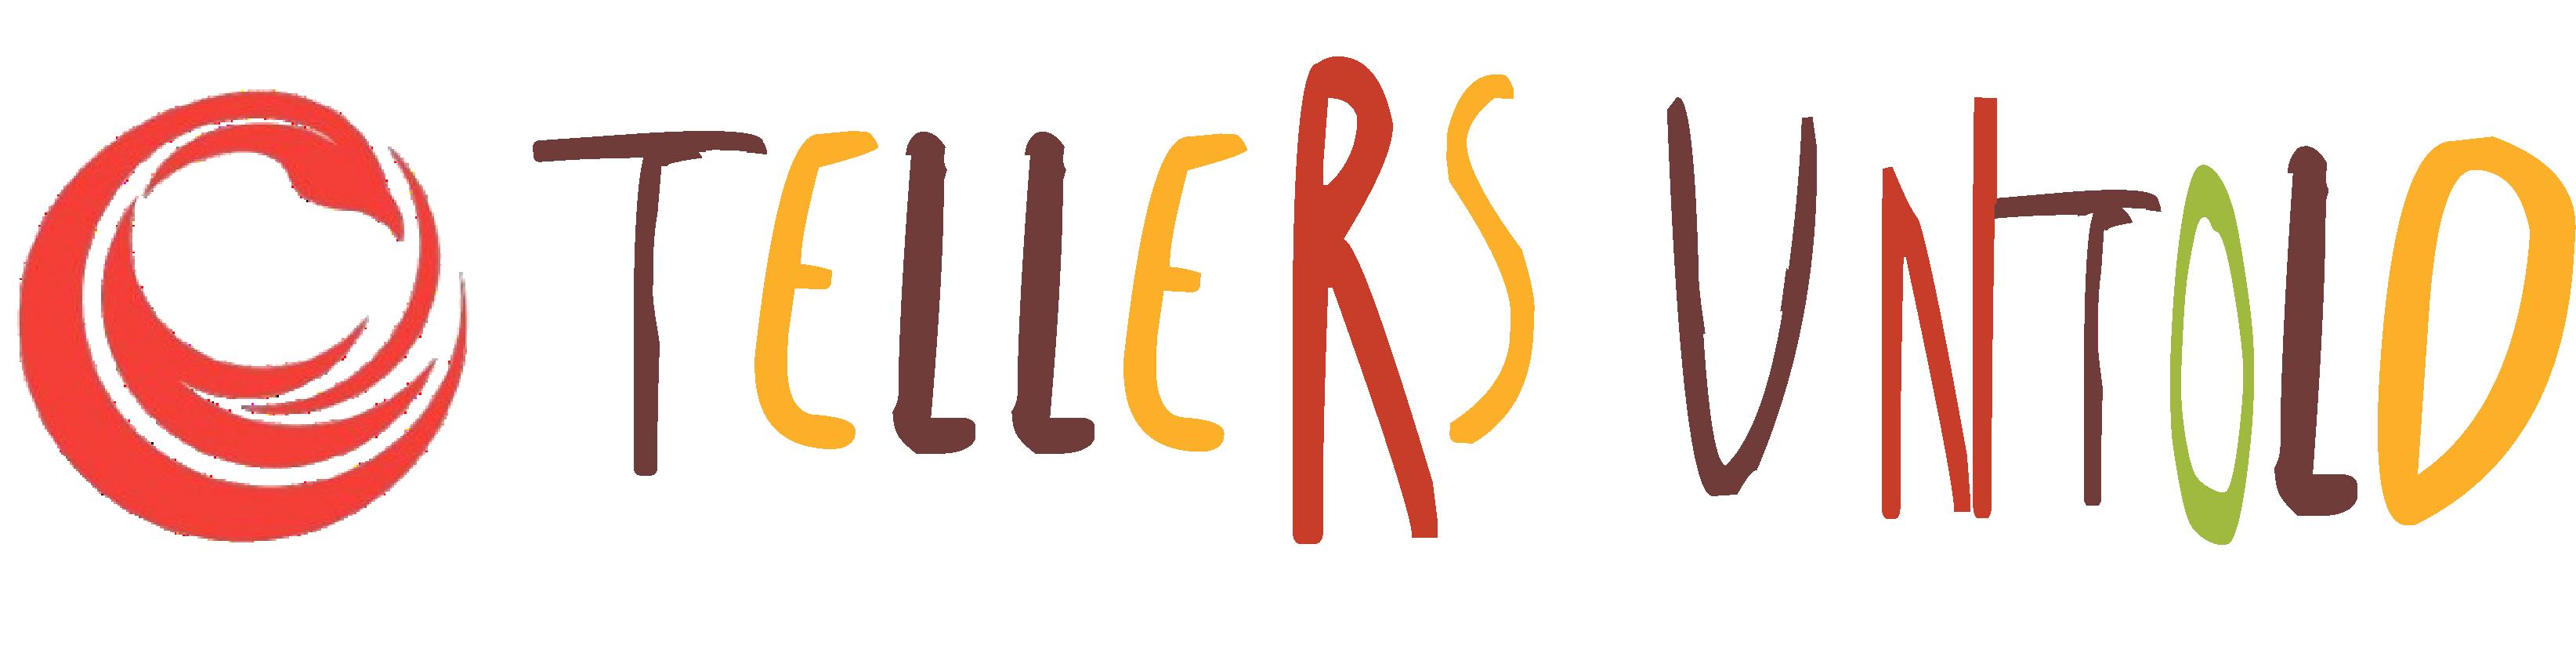 Tellers Untold logo